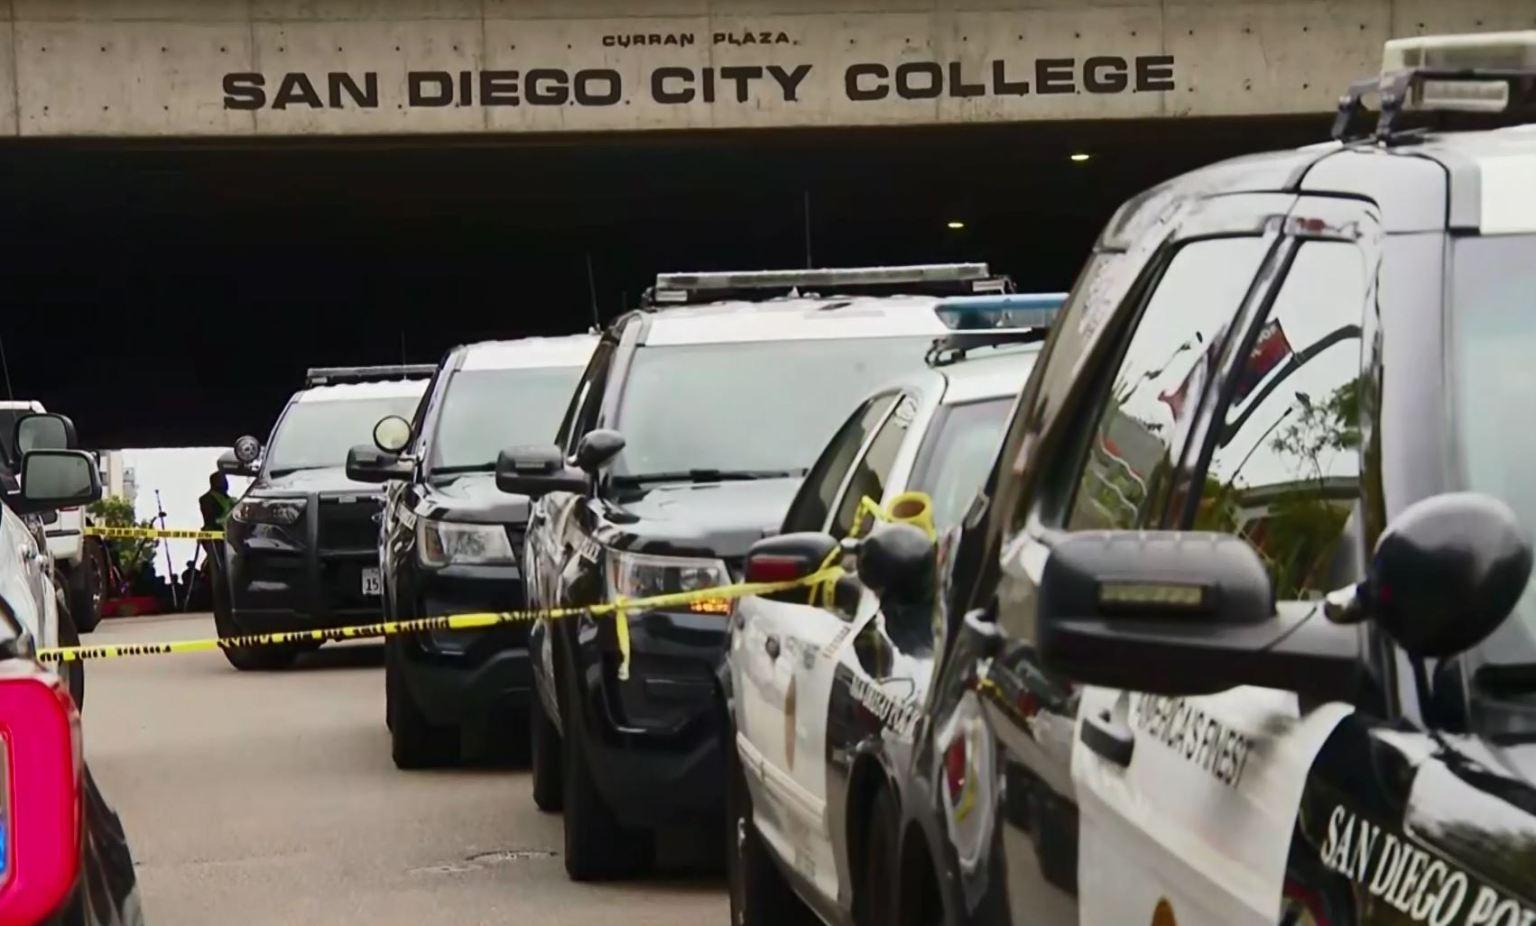 Suspected DUI Driver Behind Bars After Car Kills 3, Injures 6 in Roadside Camp